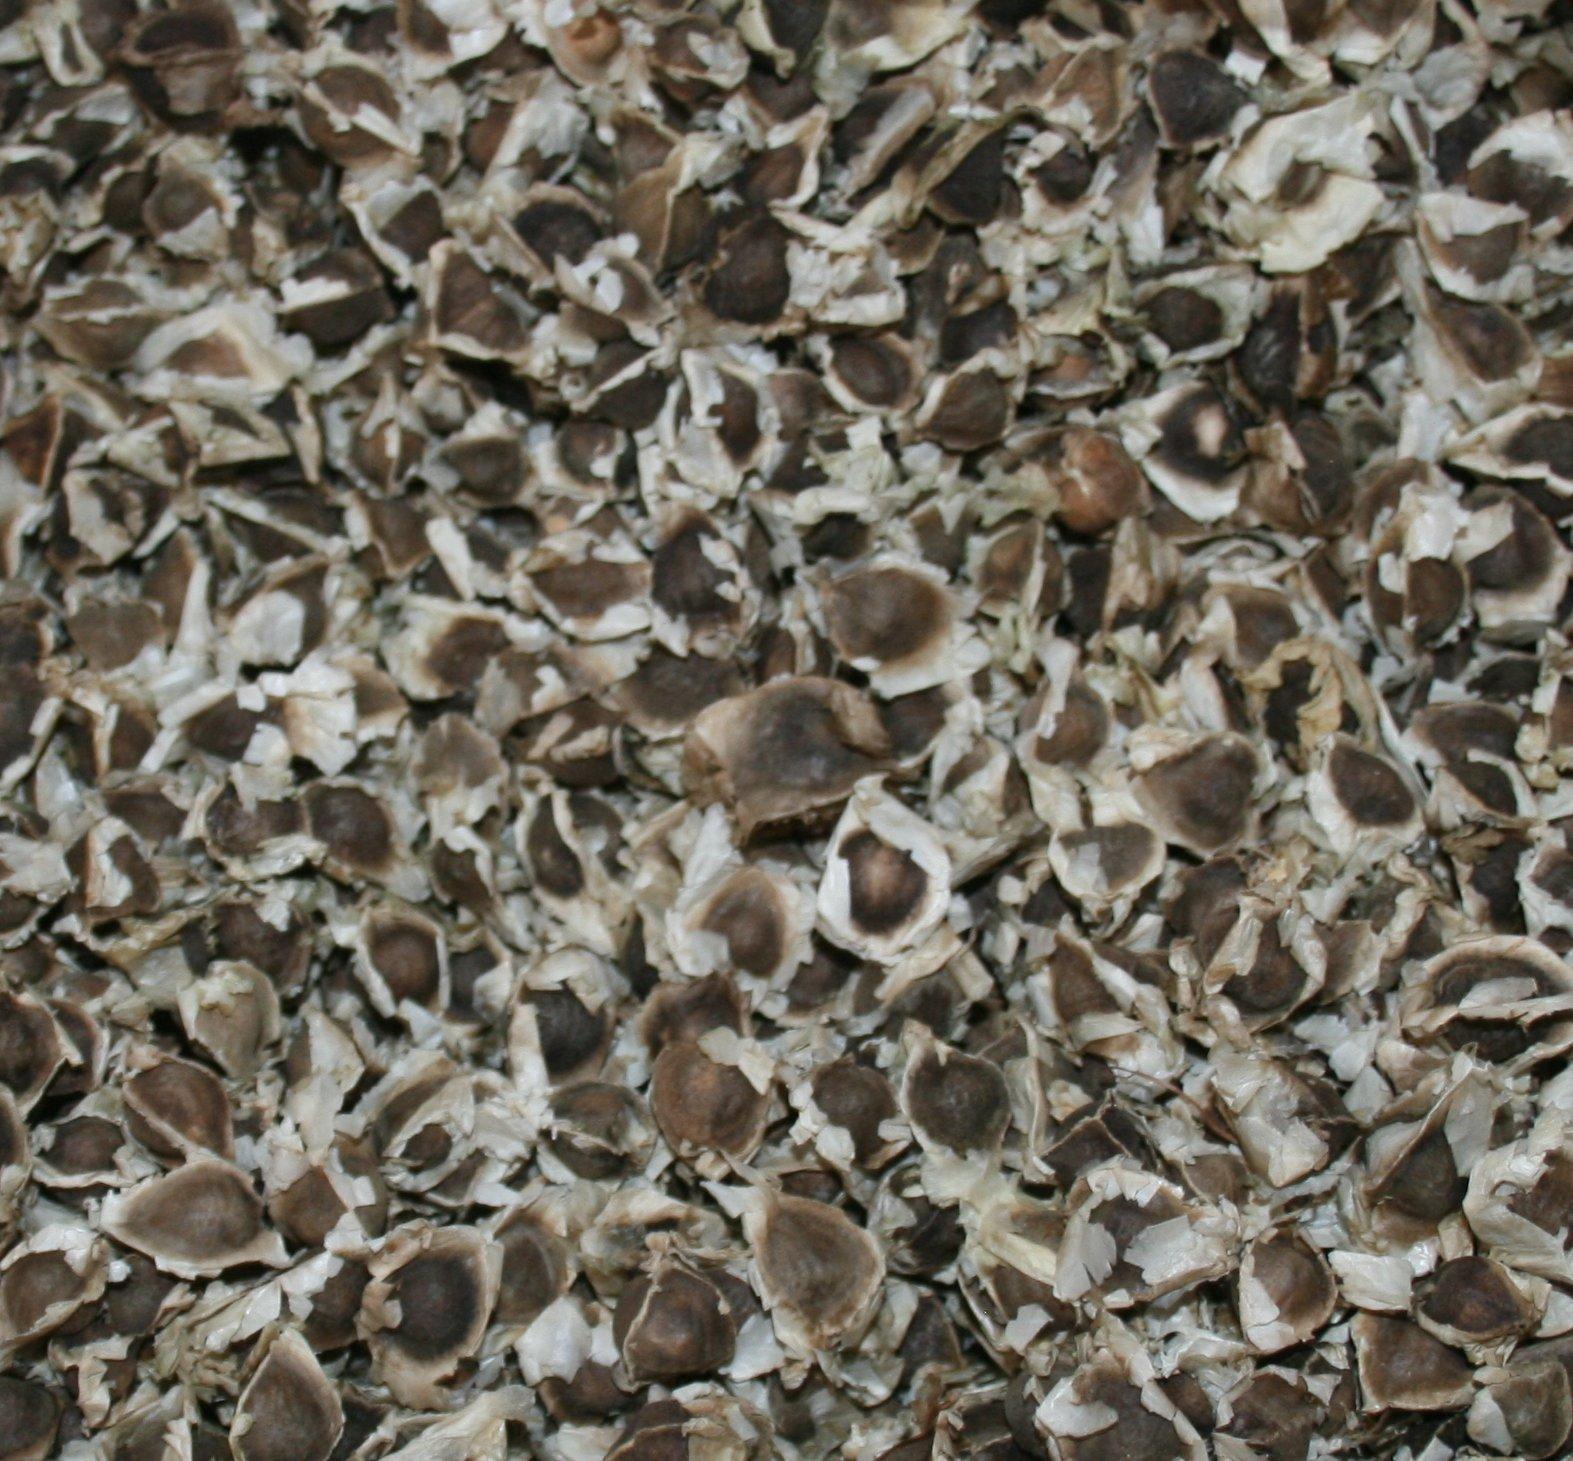 Wholesale Moringa Oleifera Seeds - Great Germination - US Customs Cleared! (20,000)